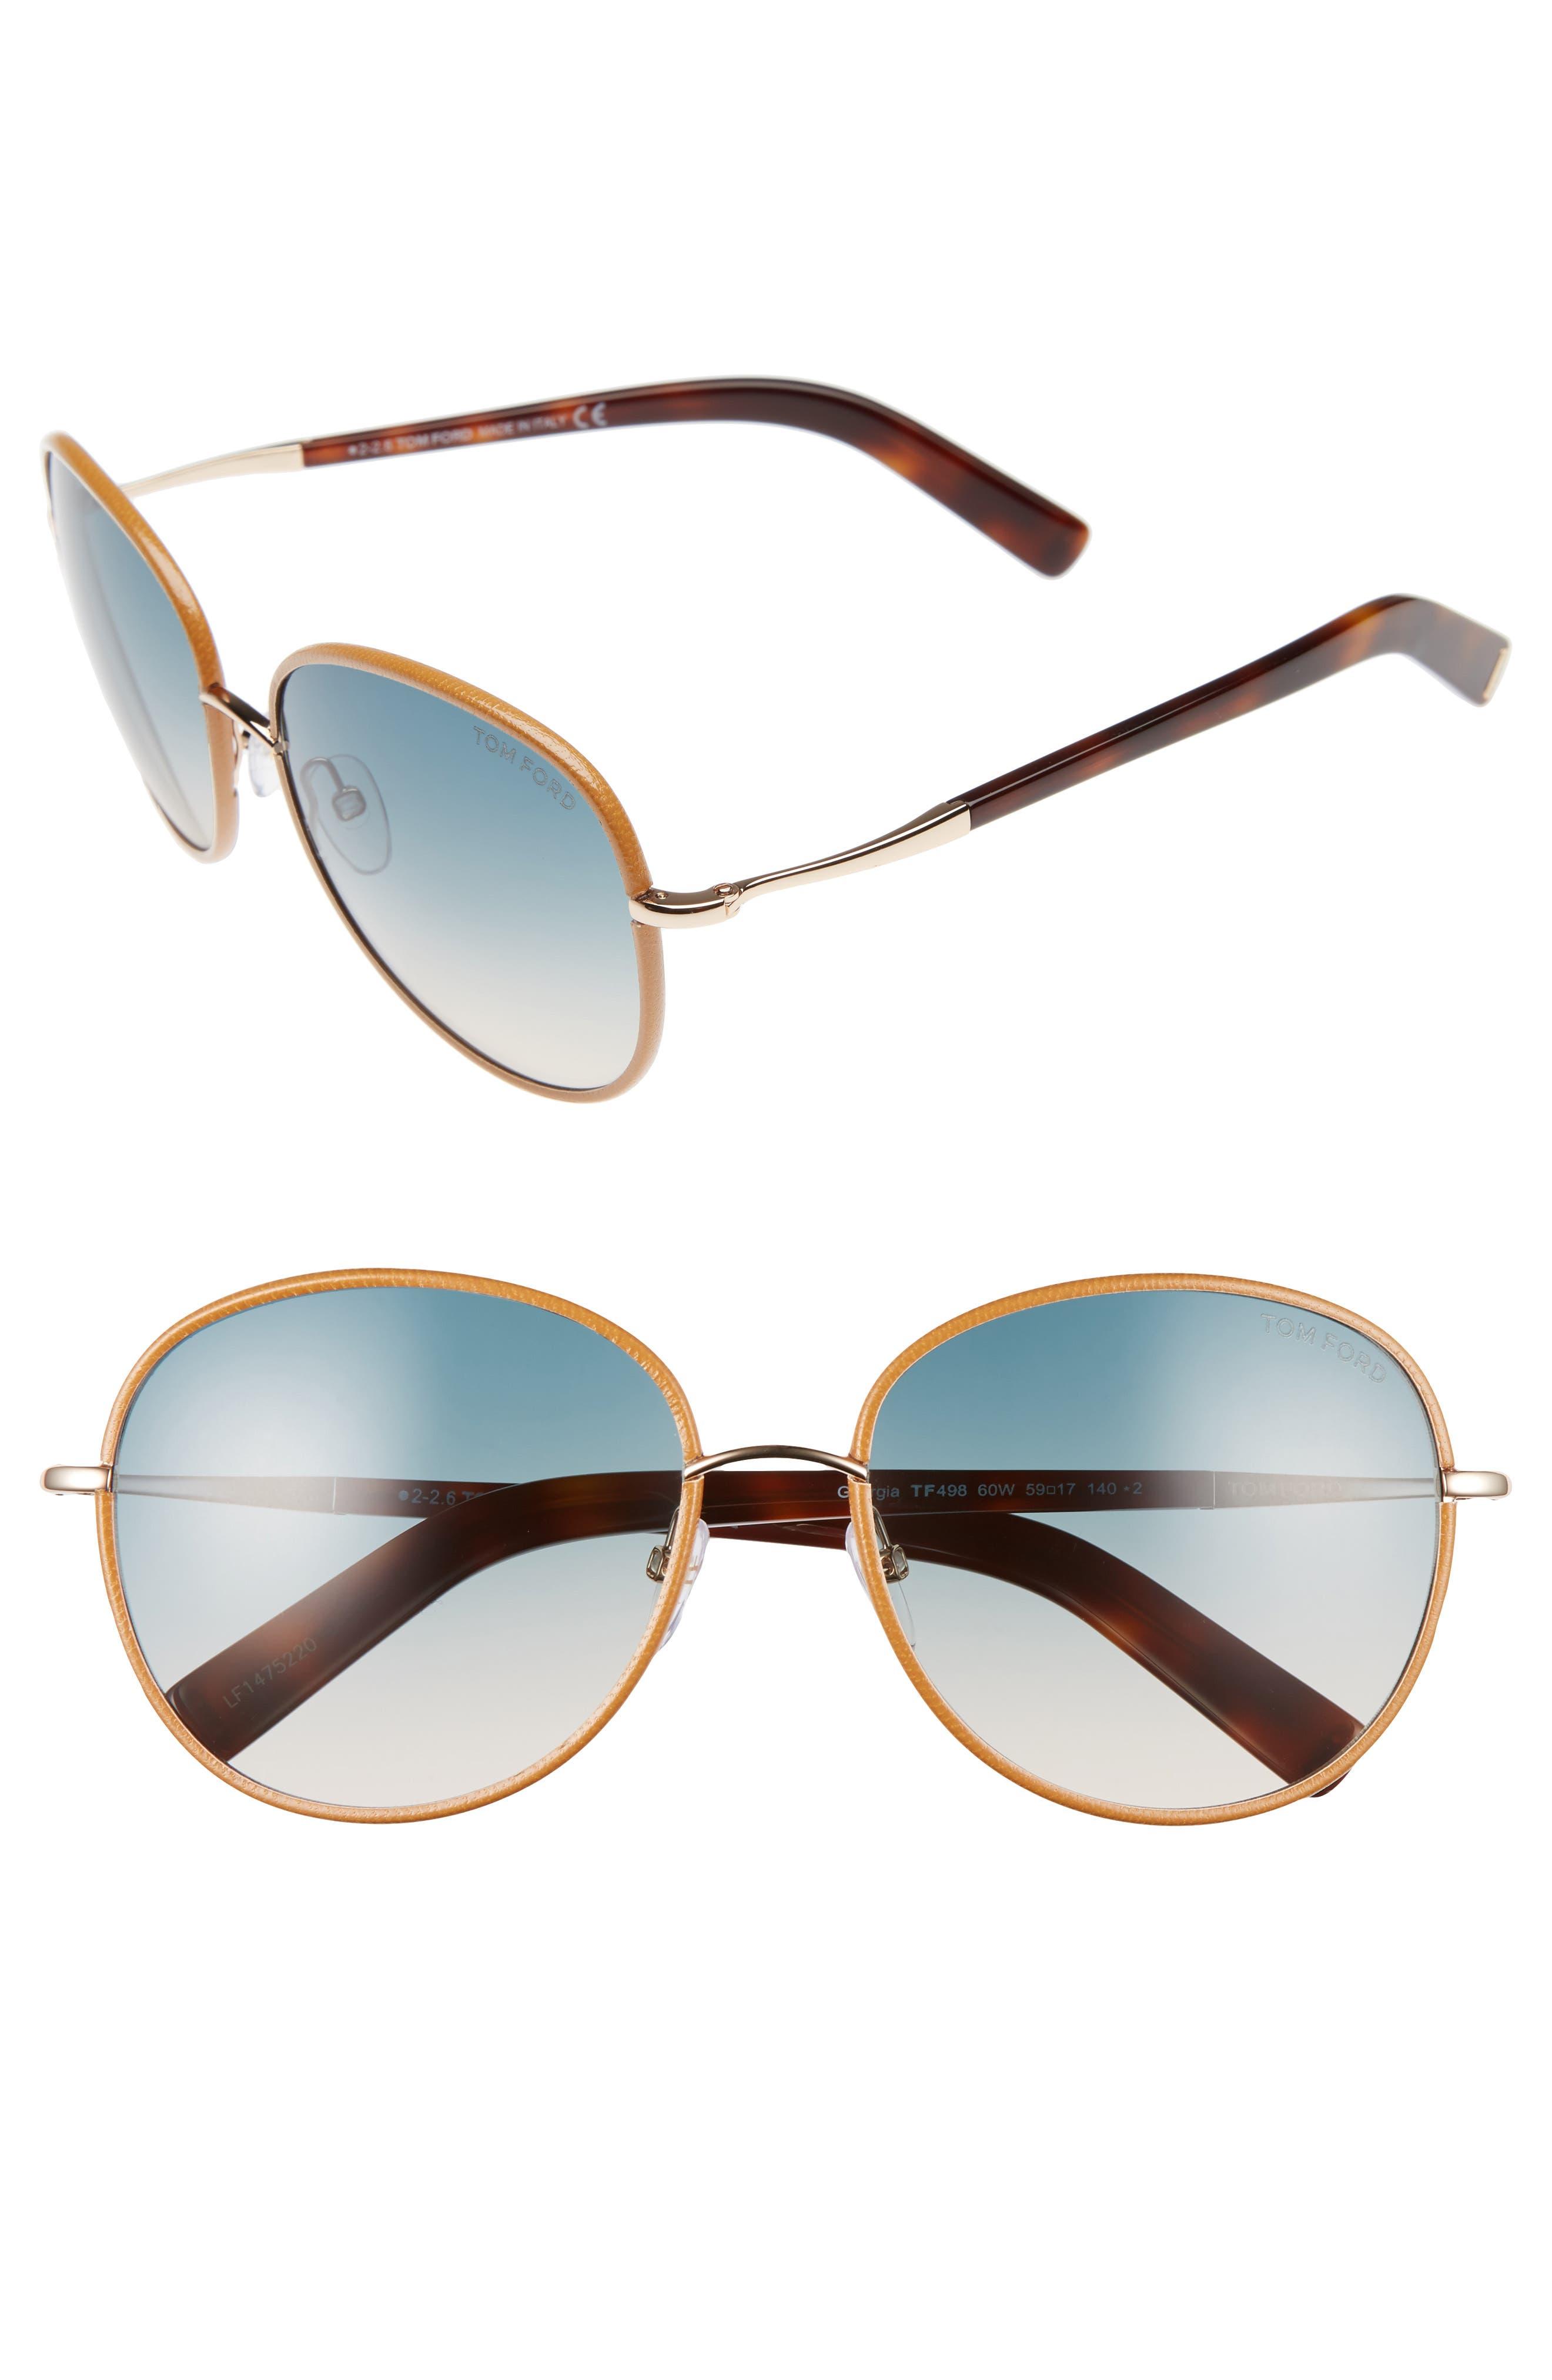 Georgia 59mm Sunglasses,                             Alternate thumbnail 2, color,                             710